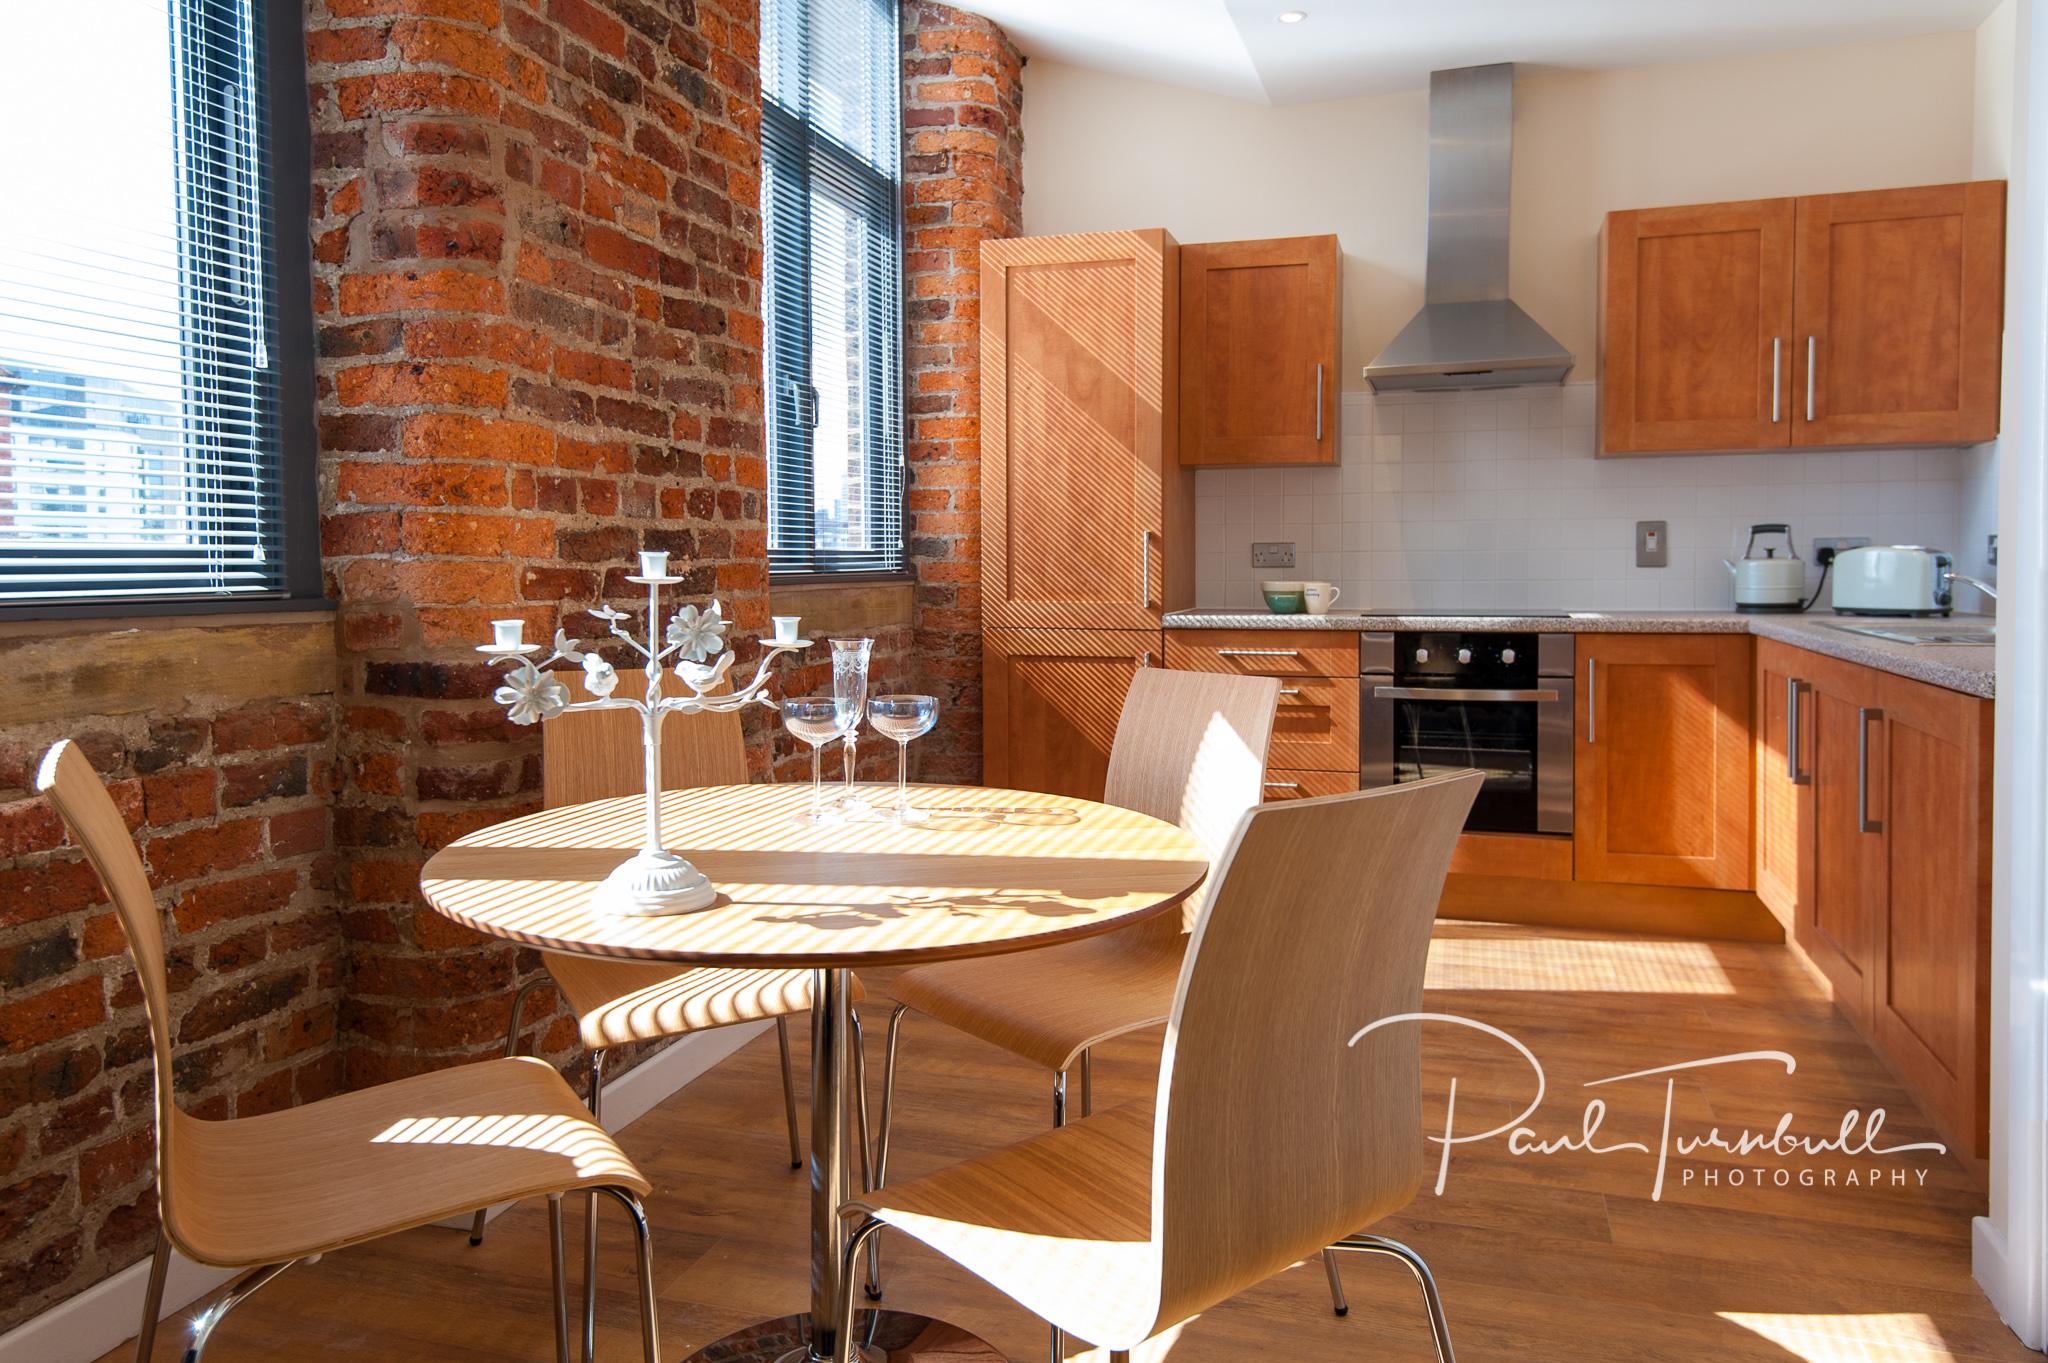 commercial-property-photographer-leeds-yorkshire-blackbrook-developments-043.jpg